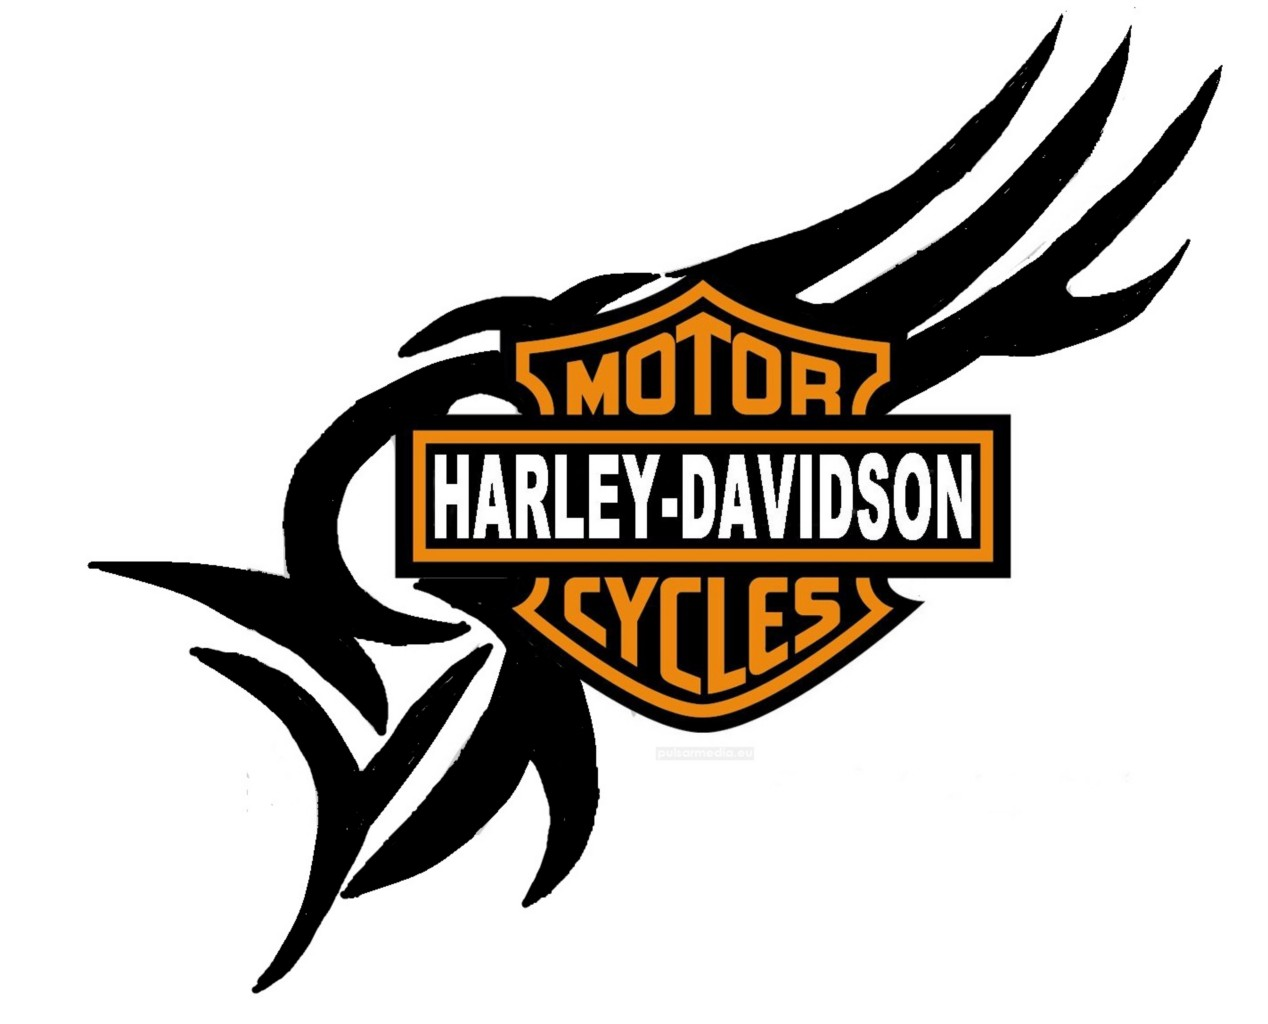 Harley Davidson clipart cycle #5